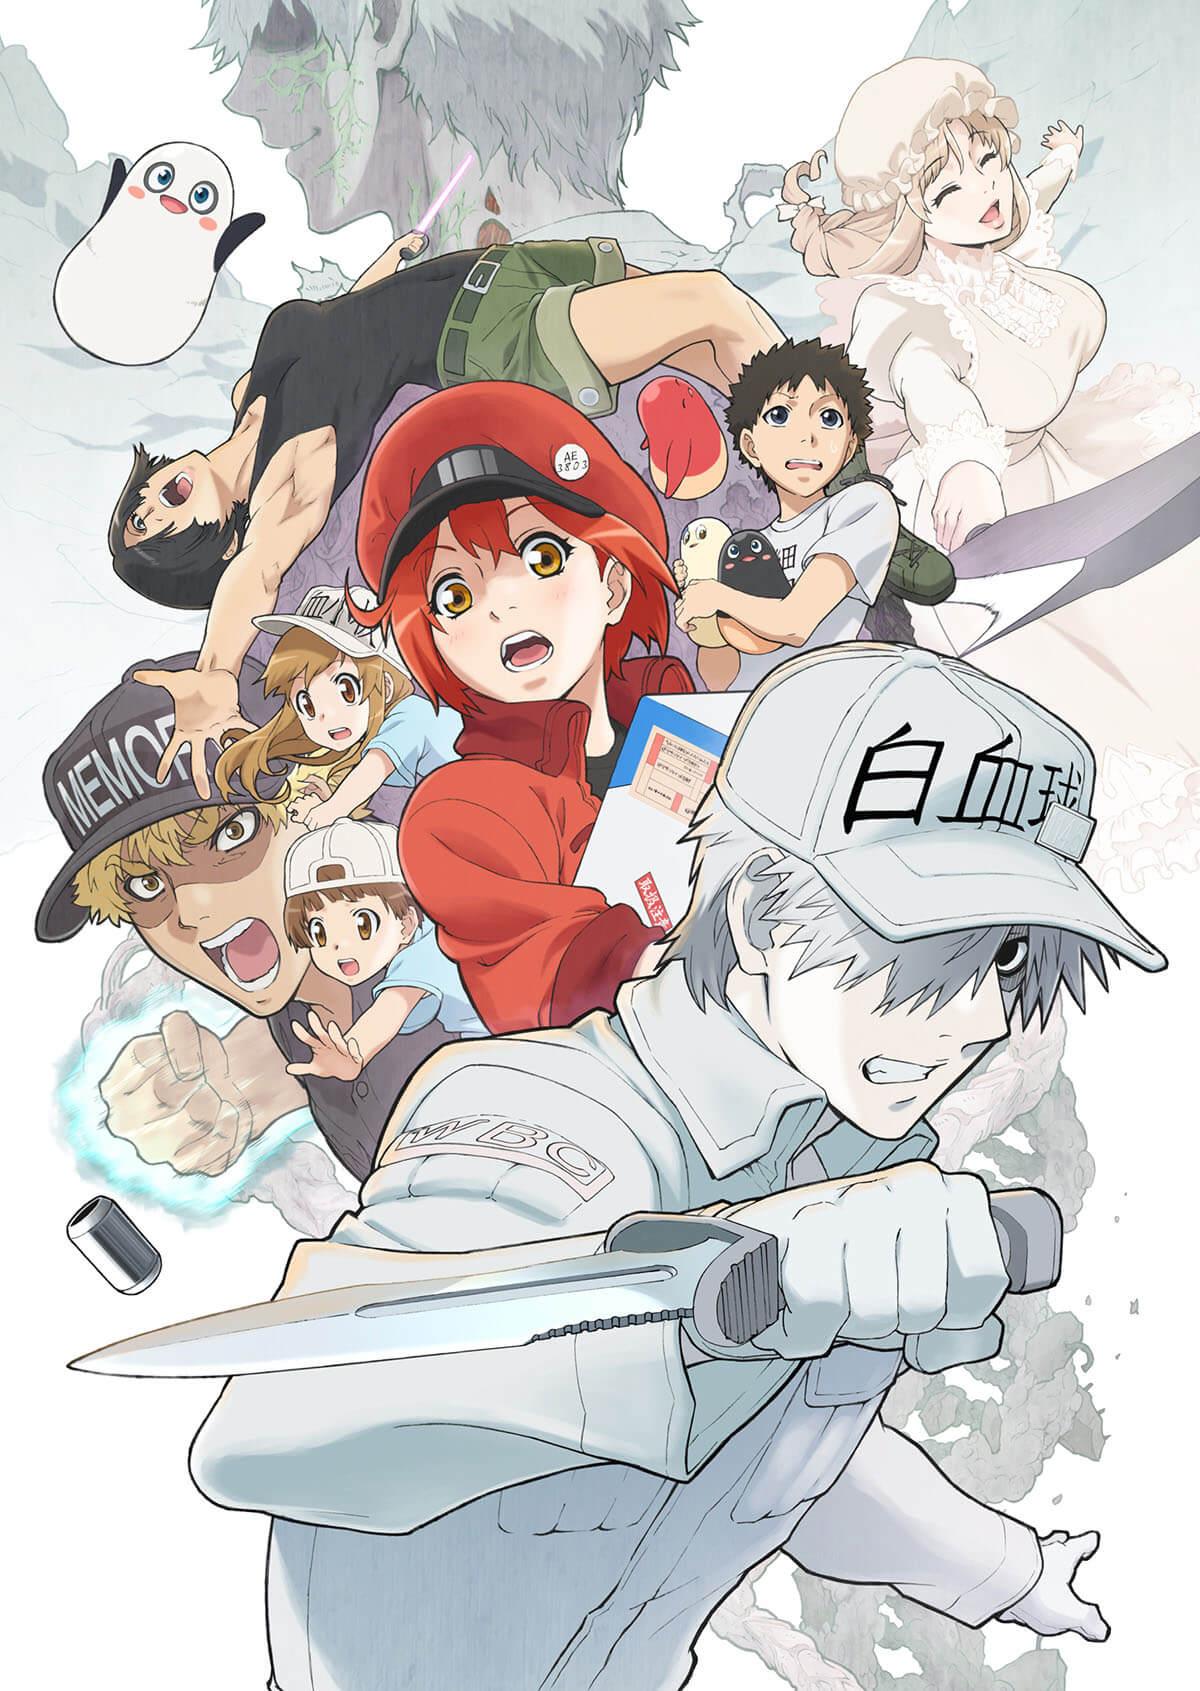 Cells At Work Season 2 Anime Key Visual Hataraku Saibou Season 2